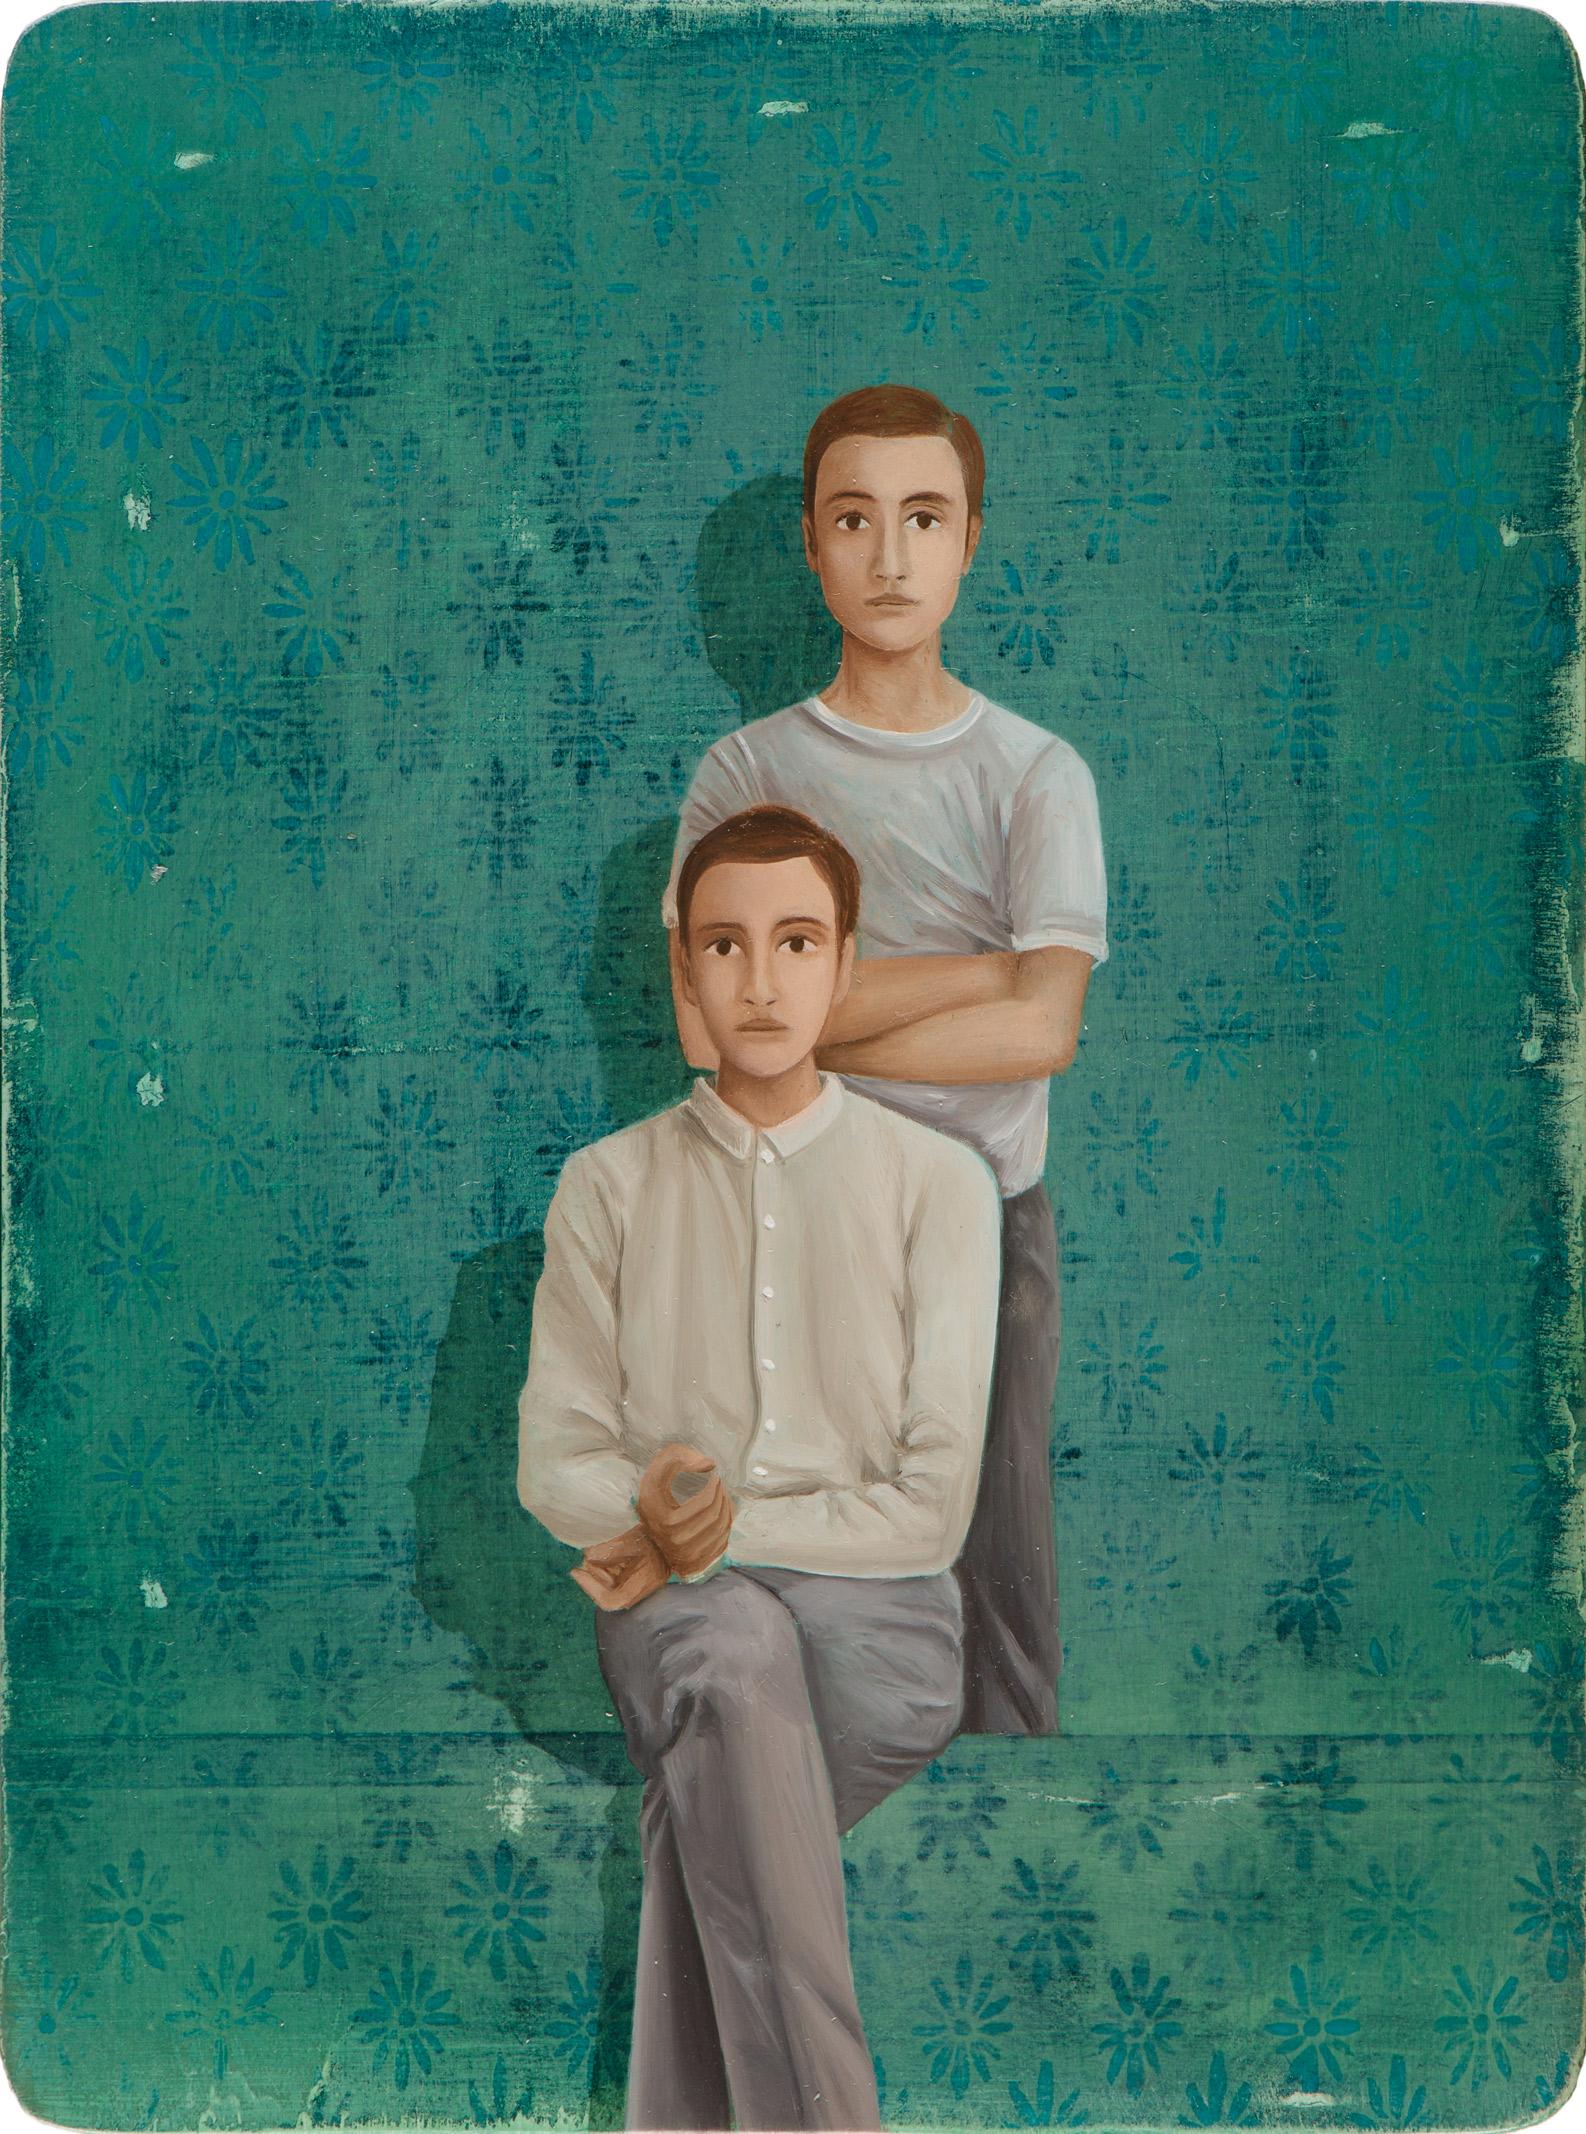 Untitled/20 x 15 cm, Oil on wood/2017